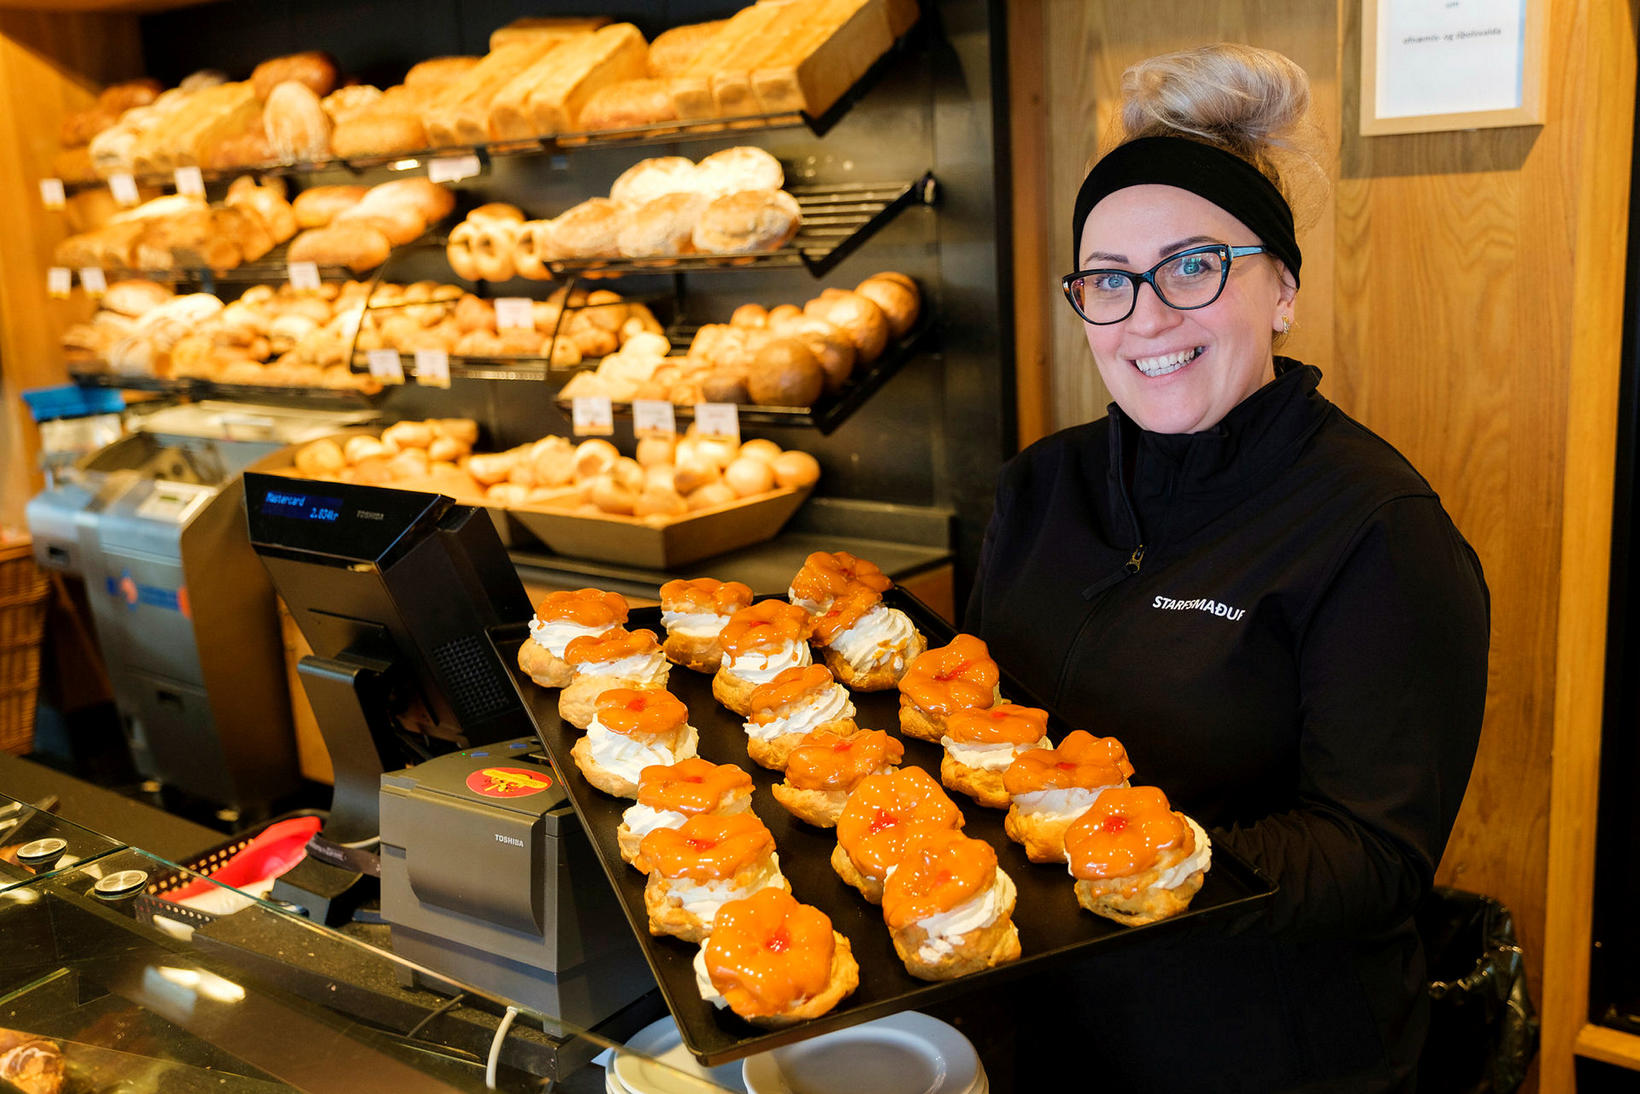 Justyna Joanna Cisowska, store manager at Bakarameistarinn, Suðurveri.